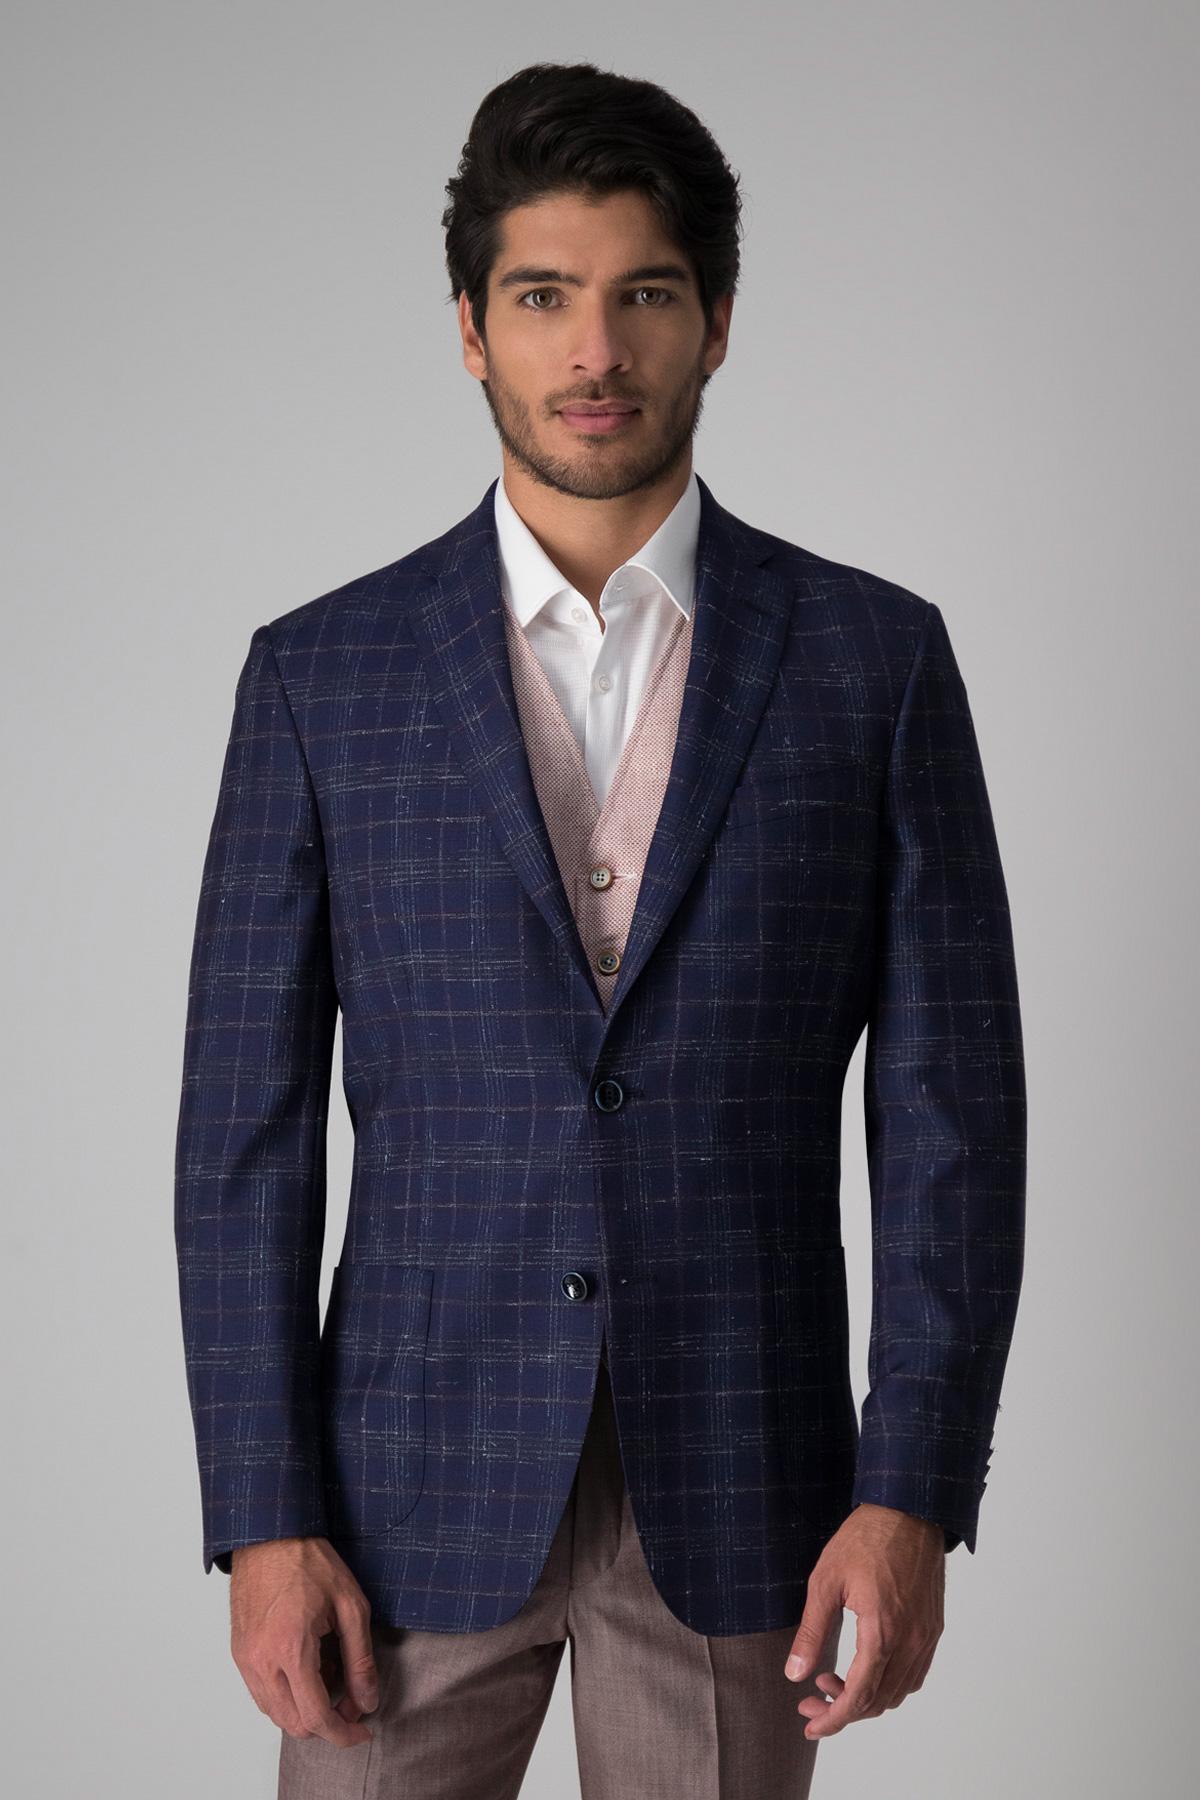 Saco Calderoni, 100%lana tela italiana, slim fit, azul cuadros vino.